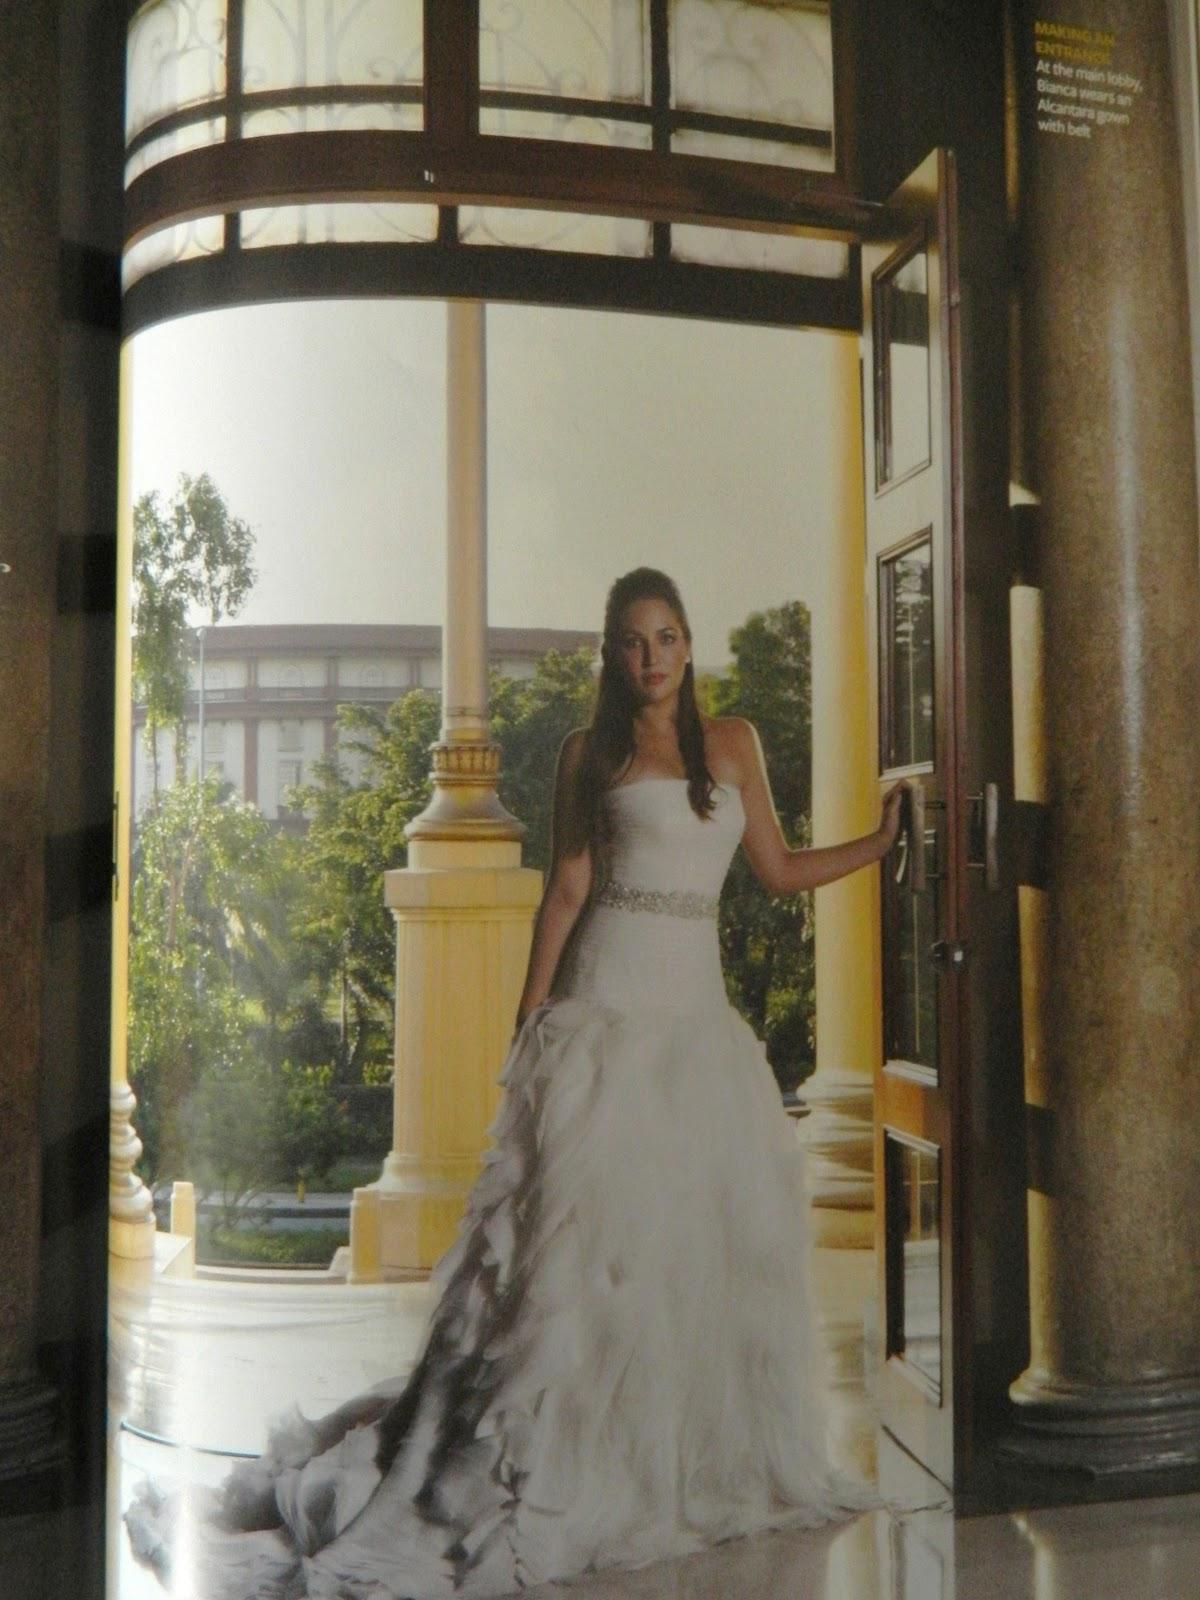 Philippine Tatler: Wedding Belles - Chic Delights